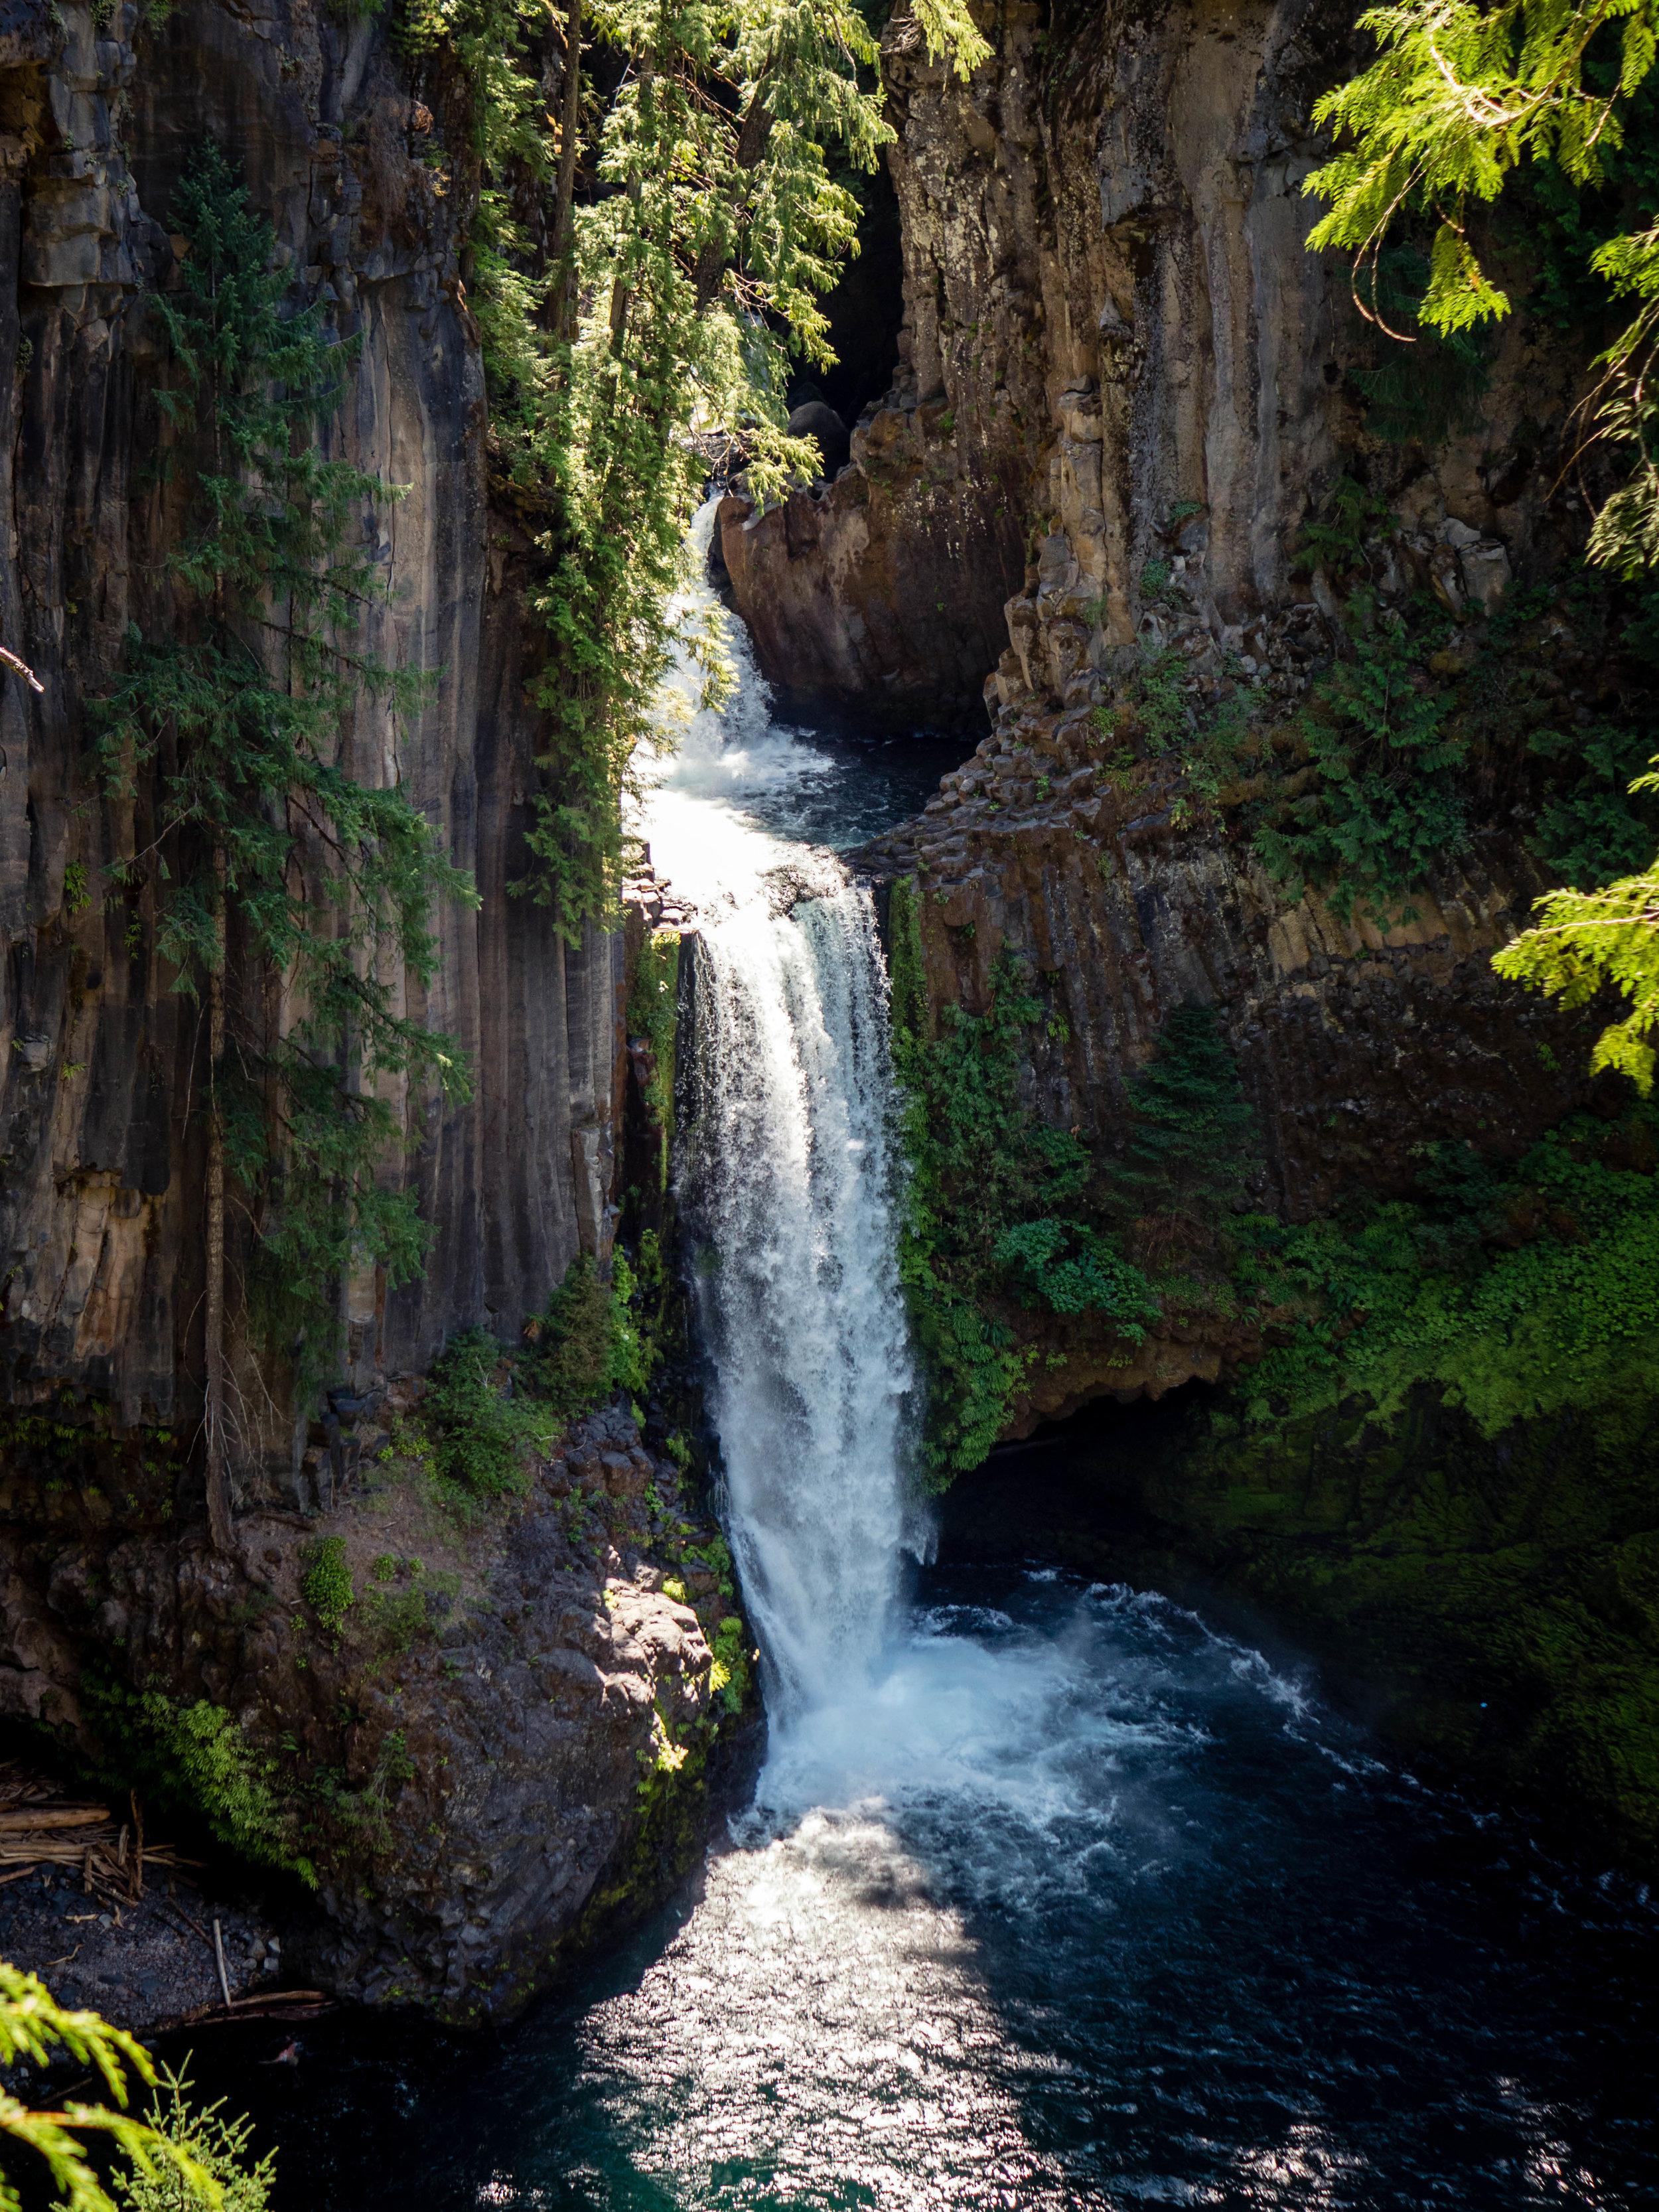 Iconic Toketee Falls in the Umpqua Basin.